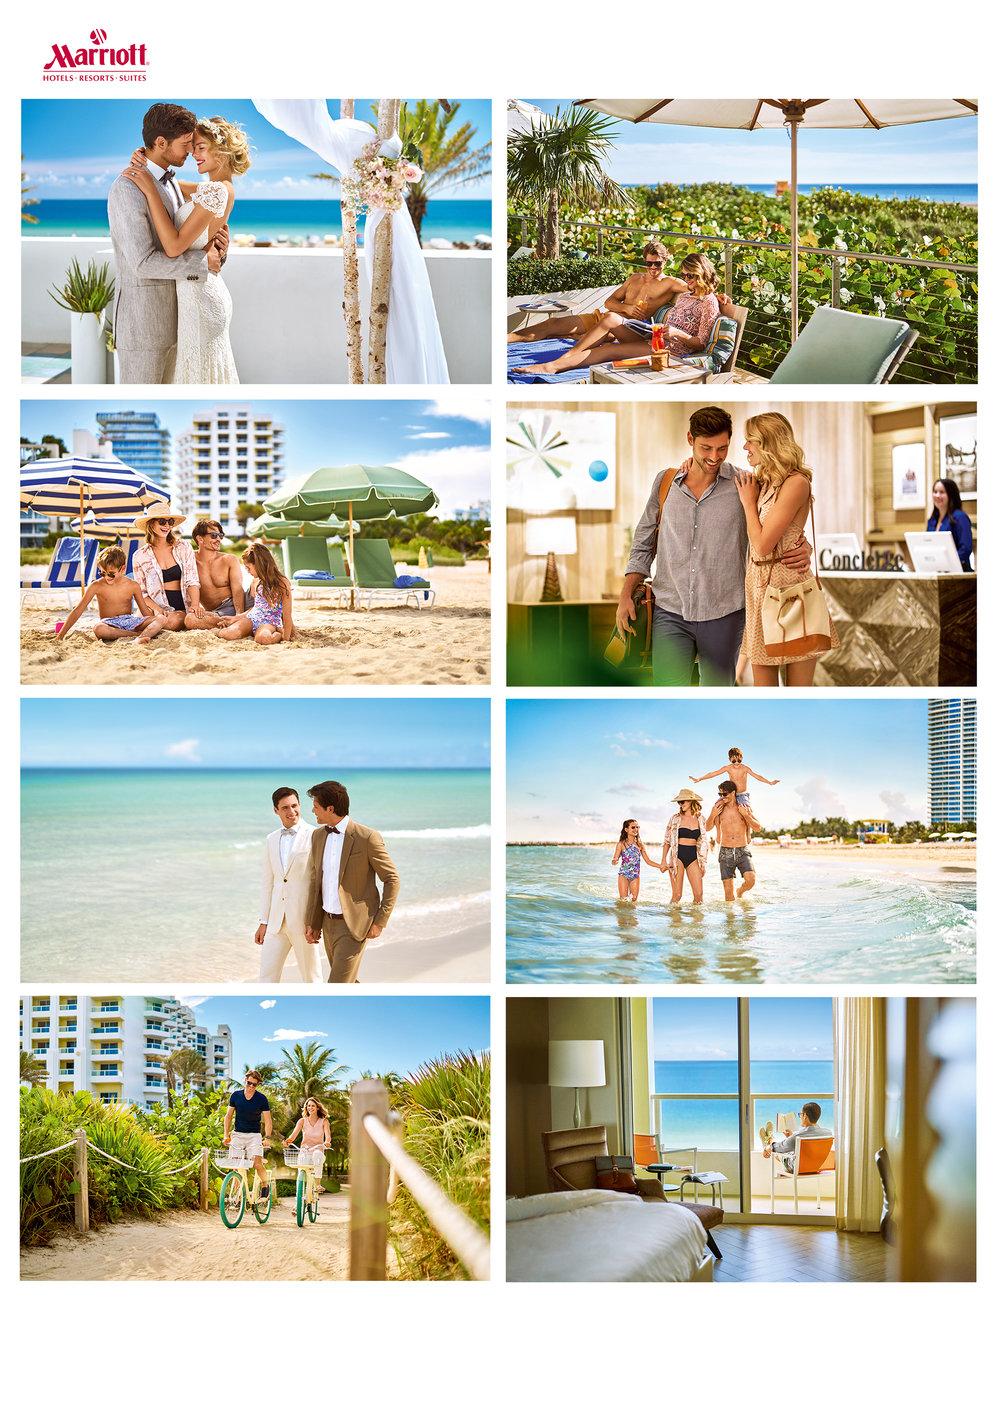 MARRIOTT_hotel_photography.jpg